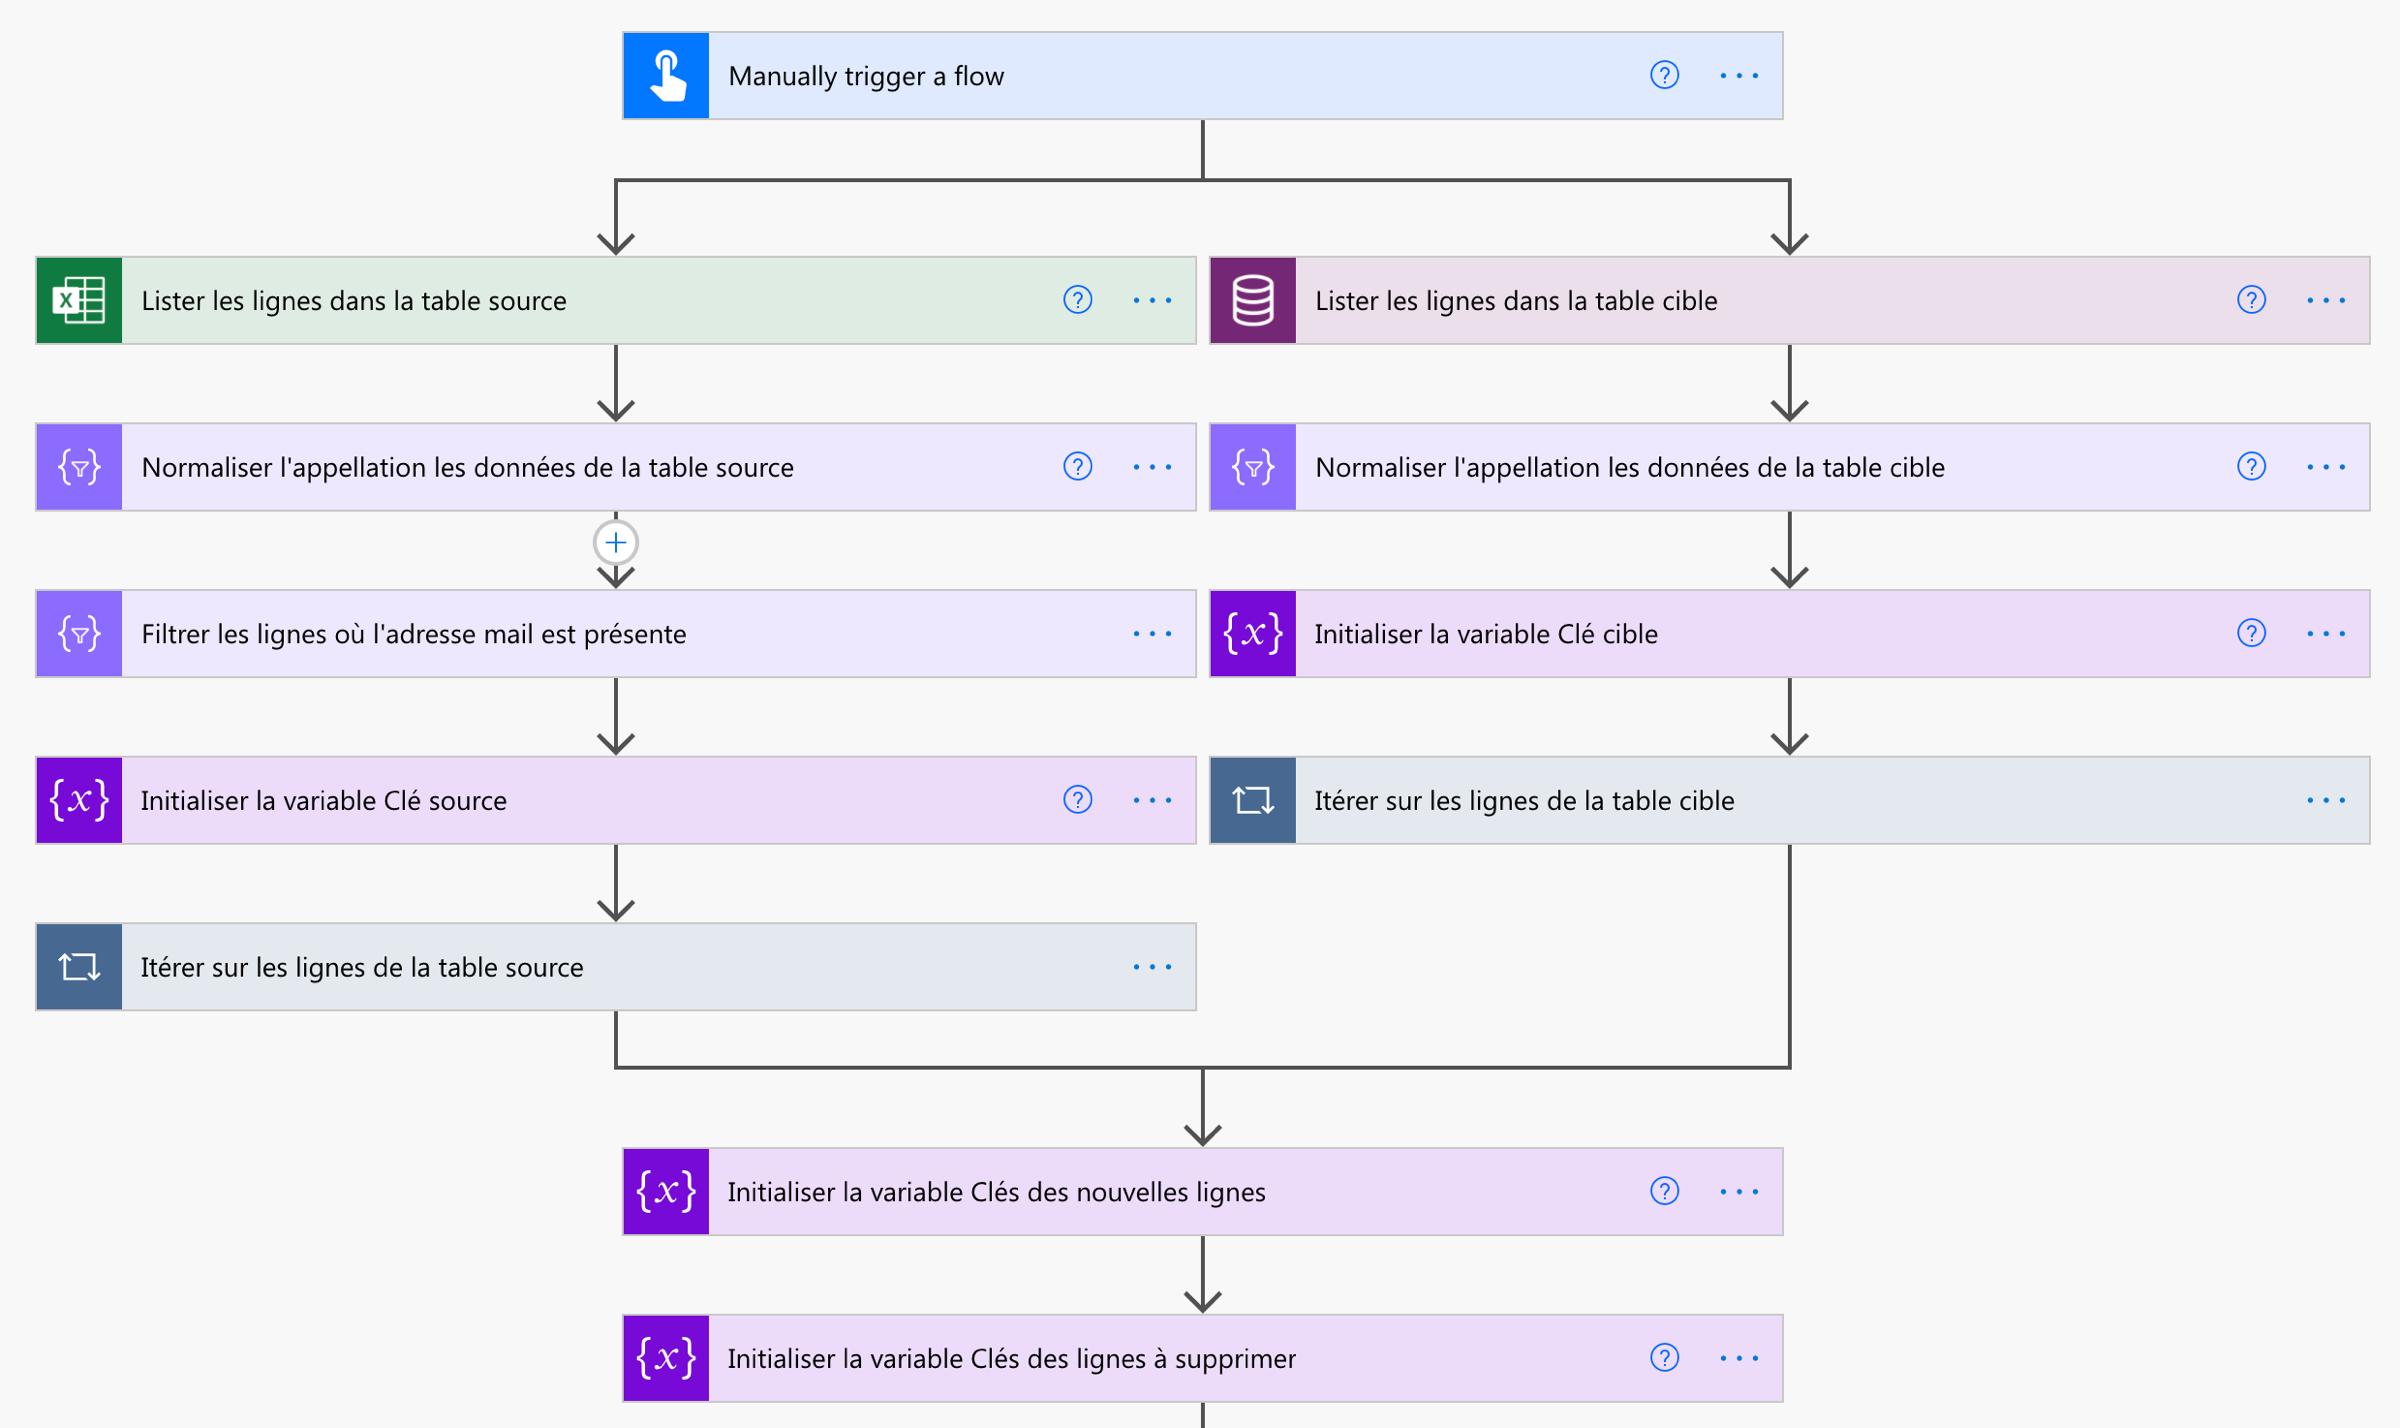 Synchroniser deux tables avec Microsoft Power Automate